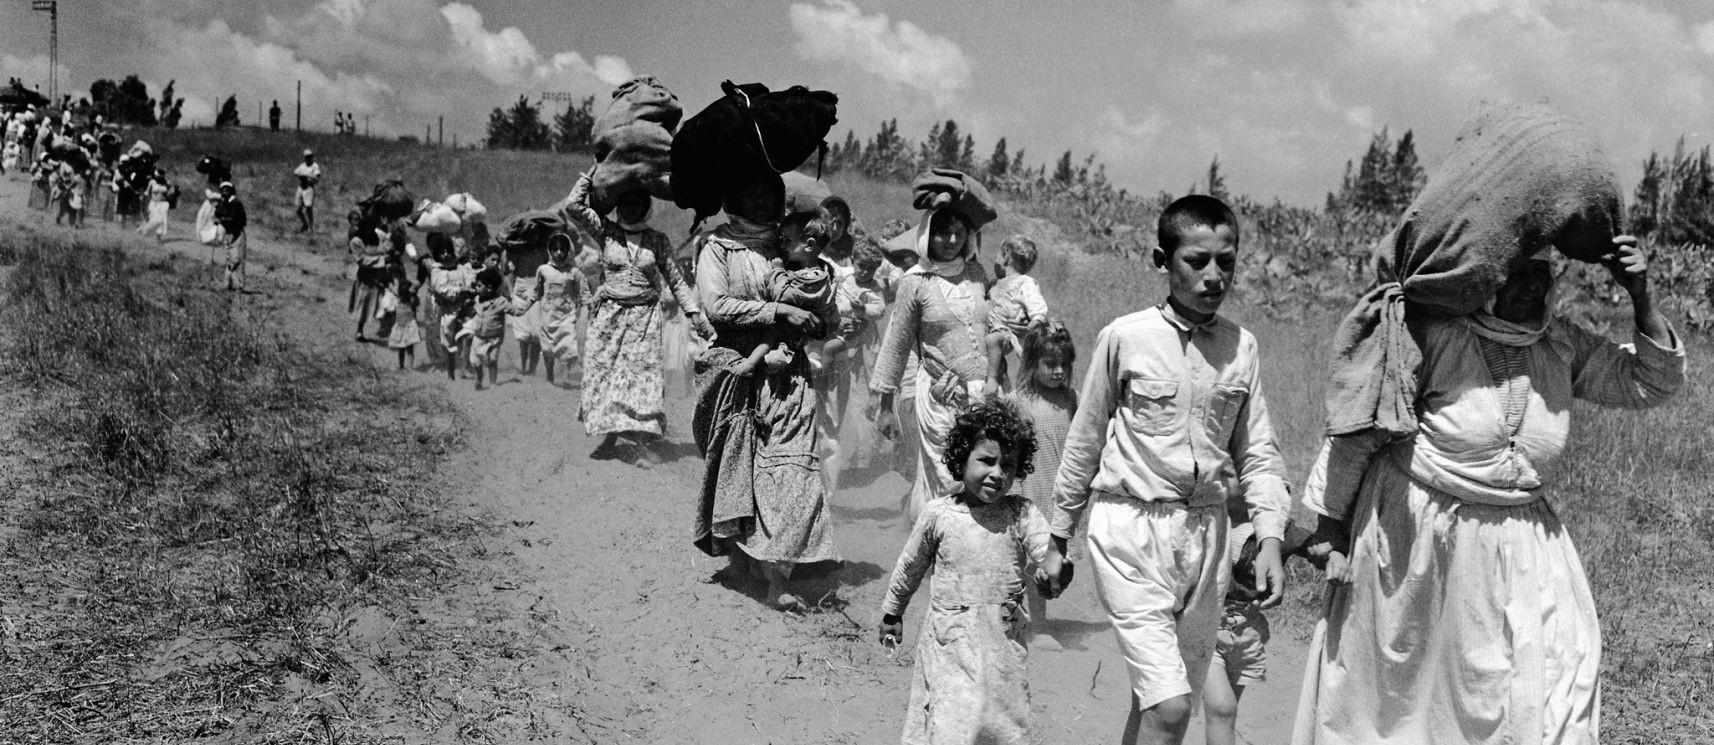 Nakba (Bencana) di Tanah Palestina